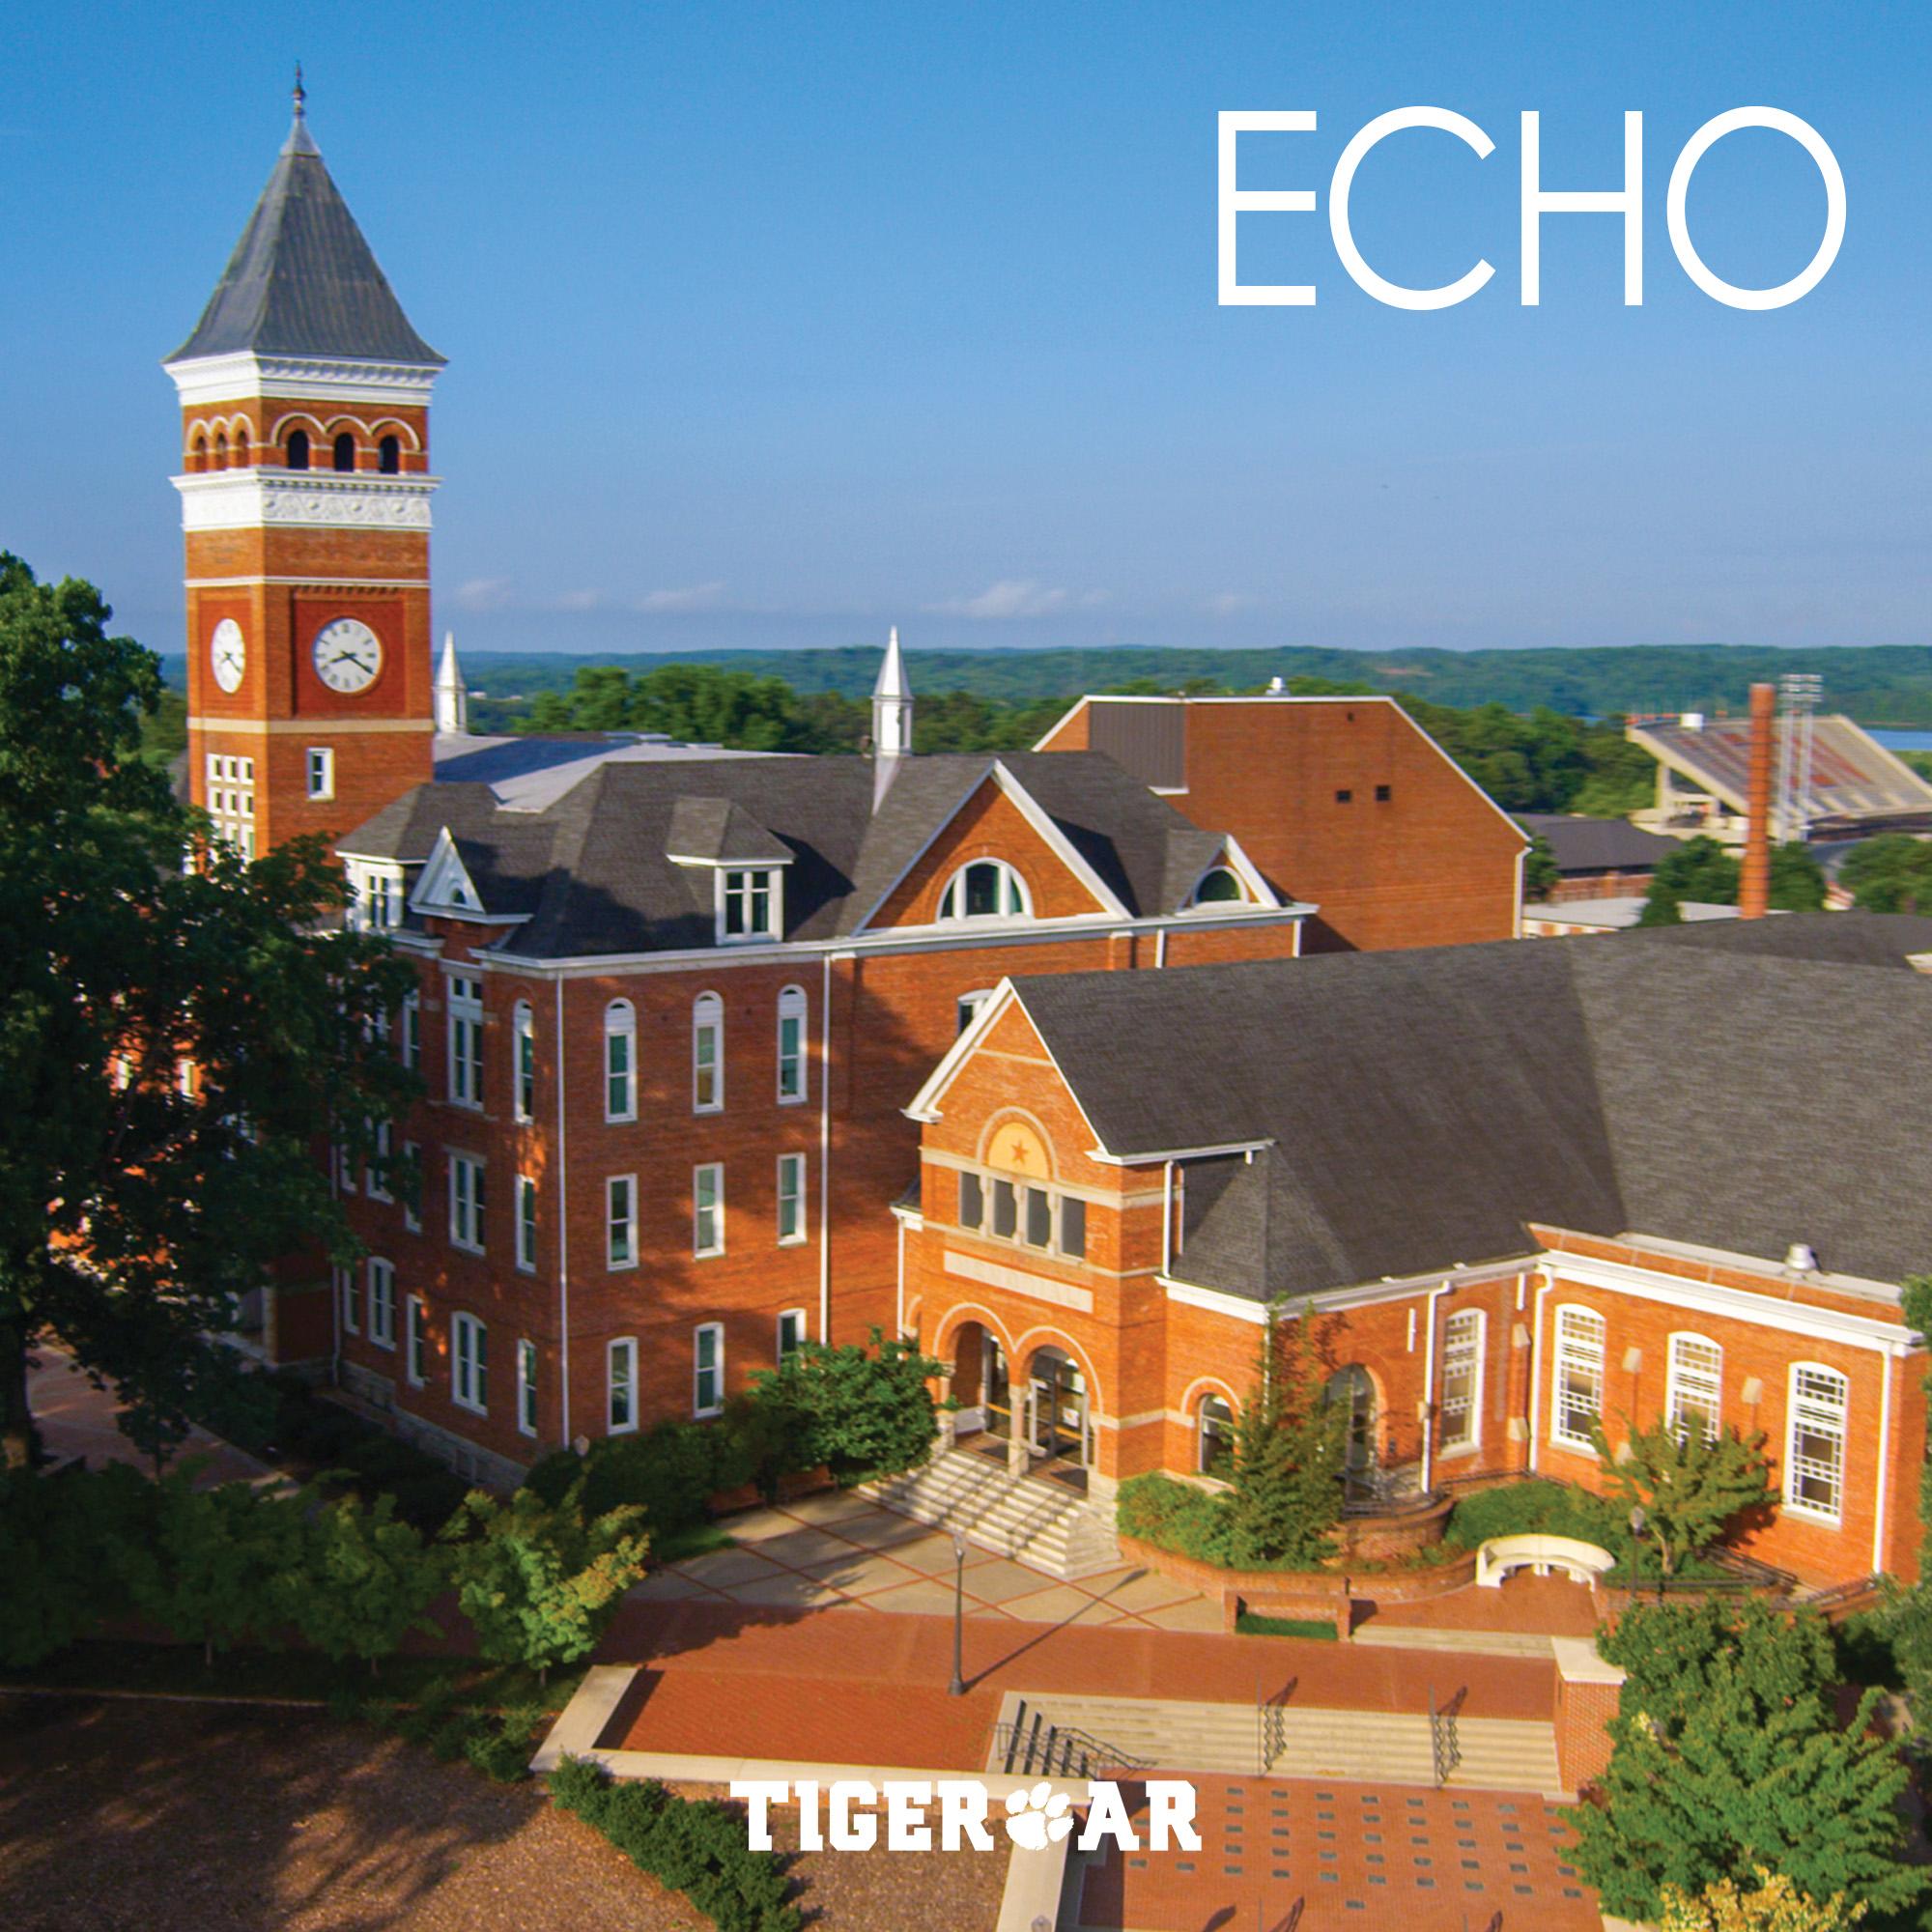 ECHO Album Cover.jpg